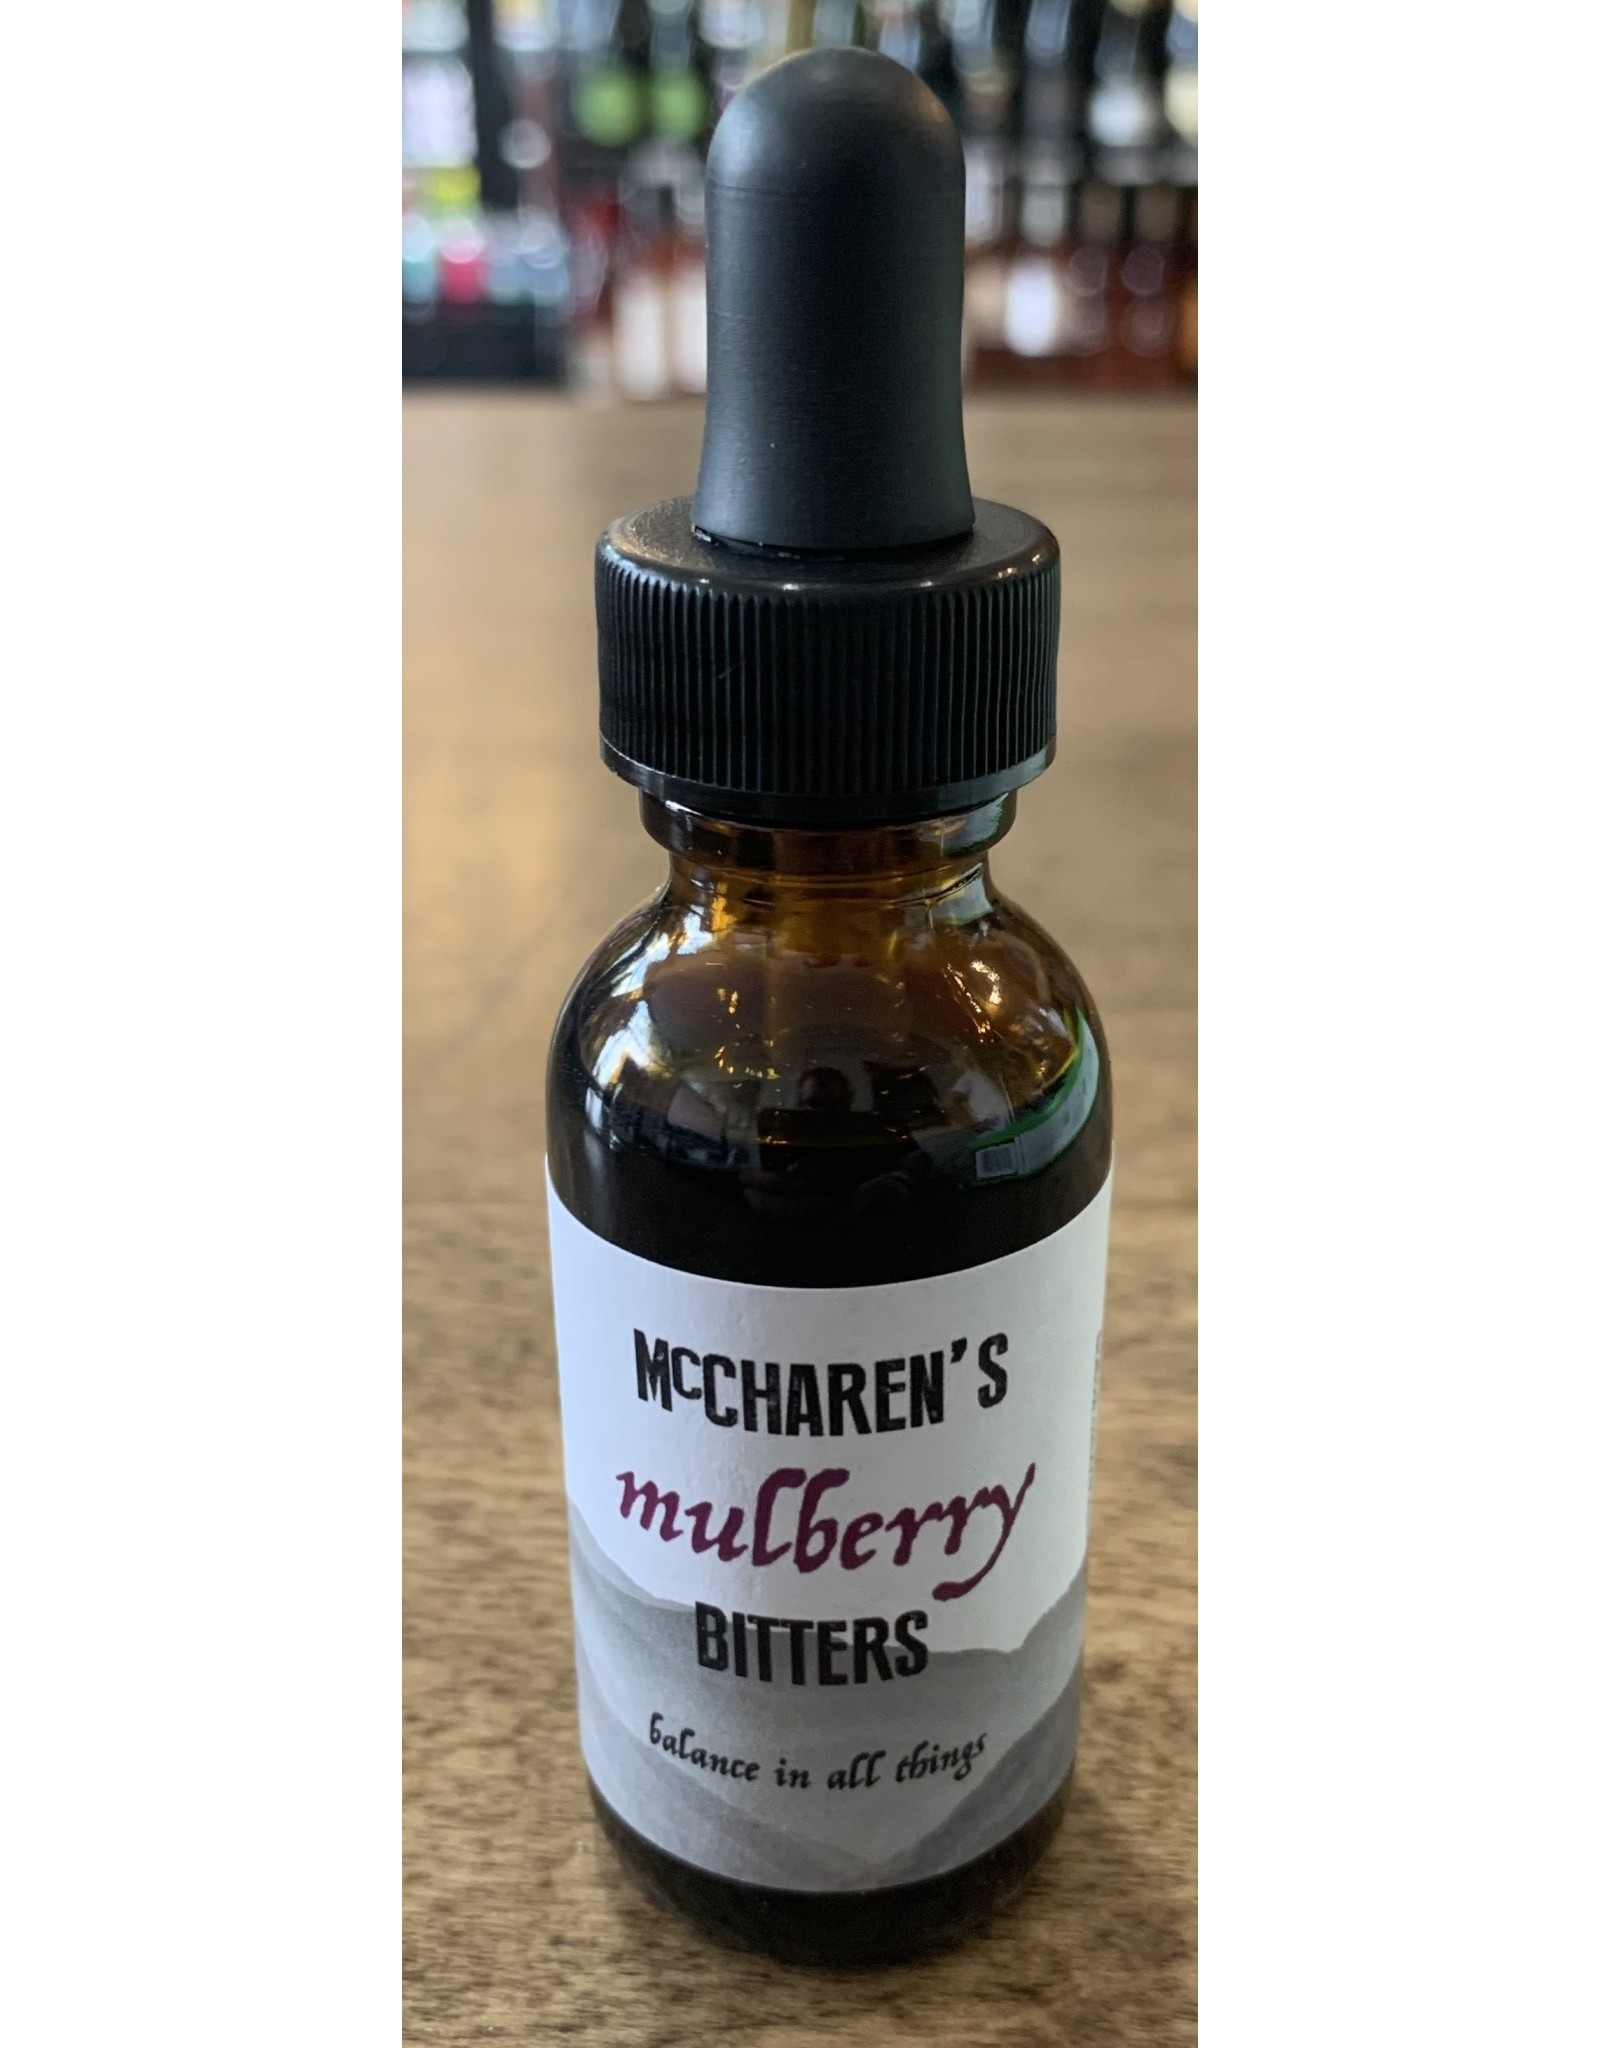 Mc Charen's McCharen's Mulberry Bitters